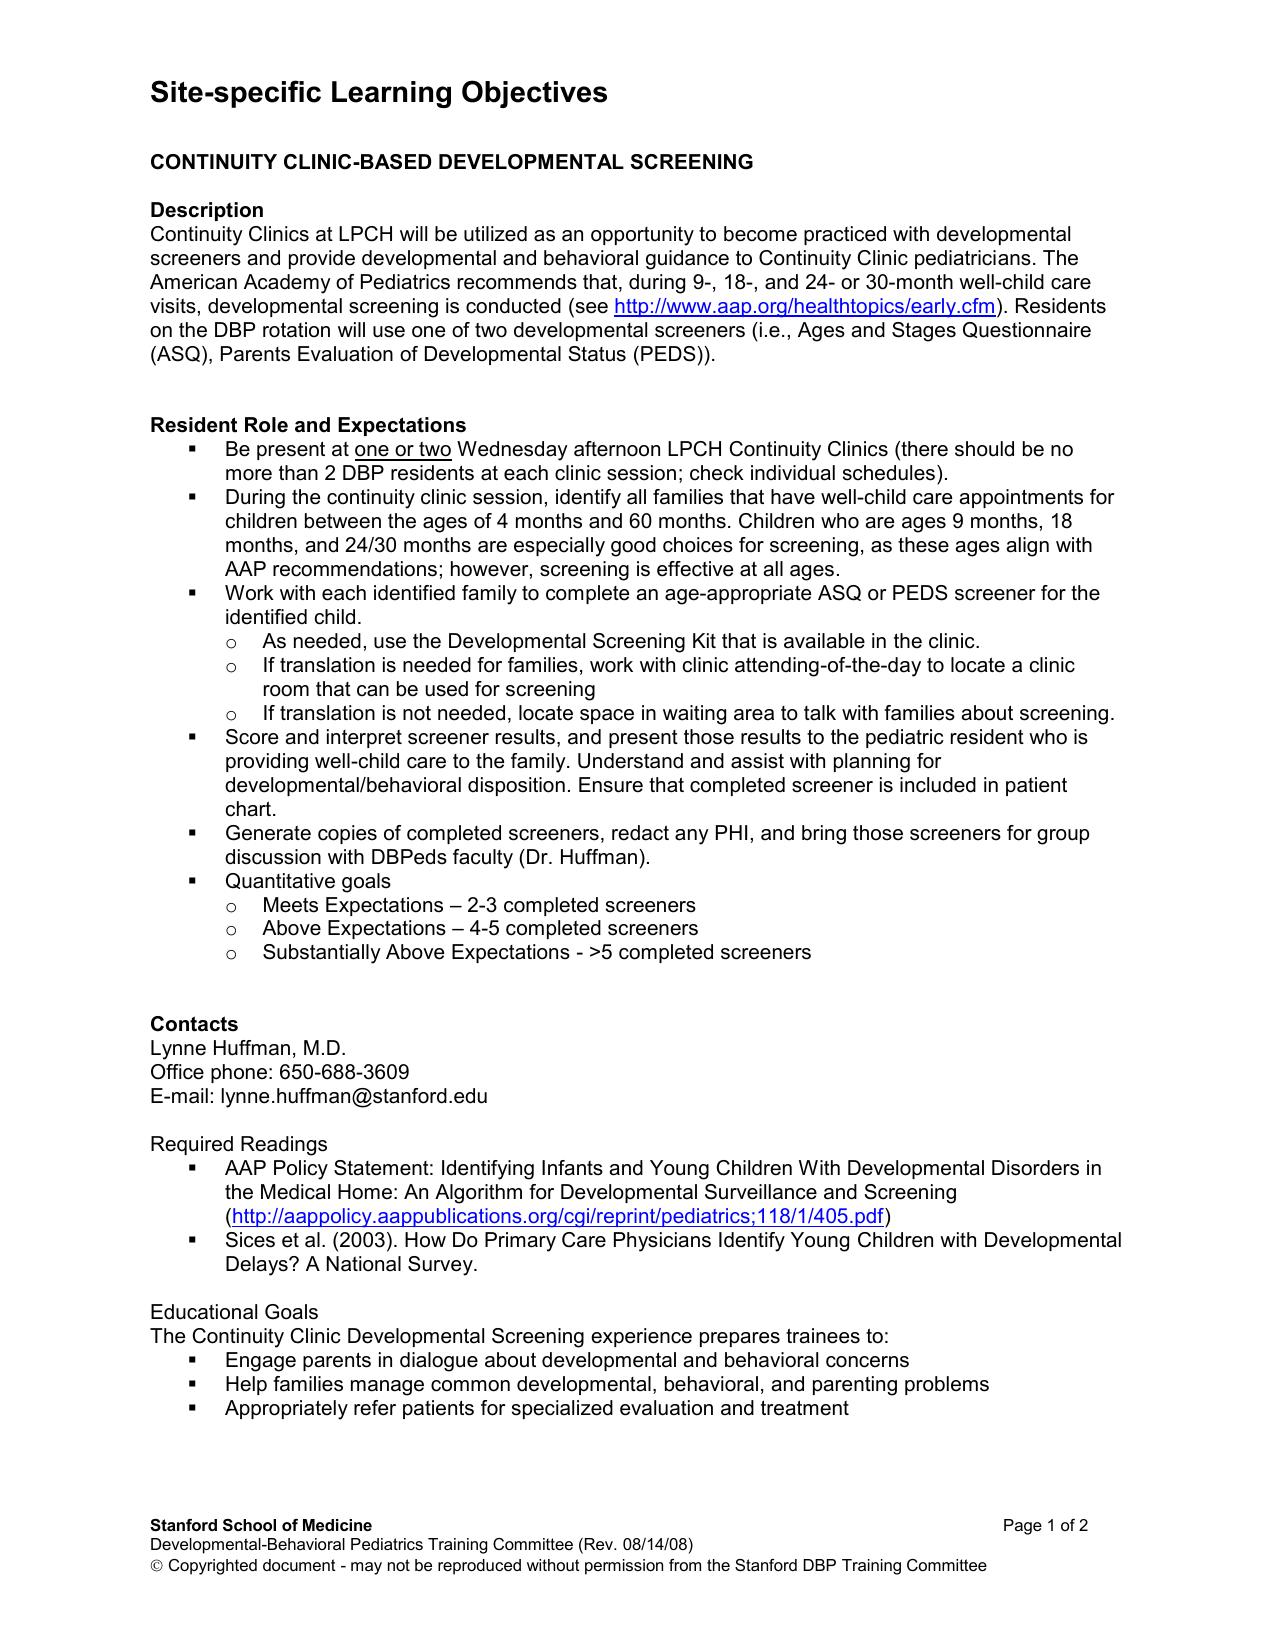 Learning Objectives - Developmental-Behavioral Pediatrics Training